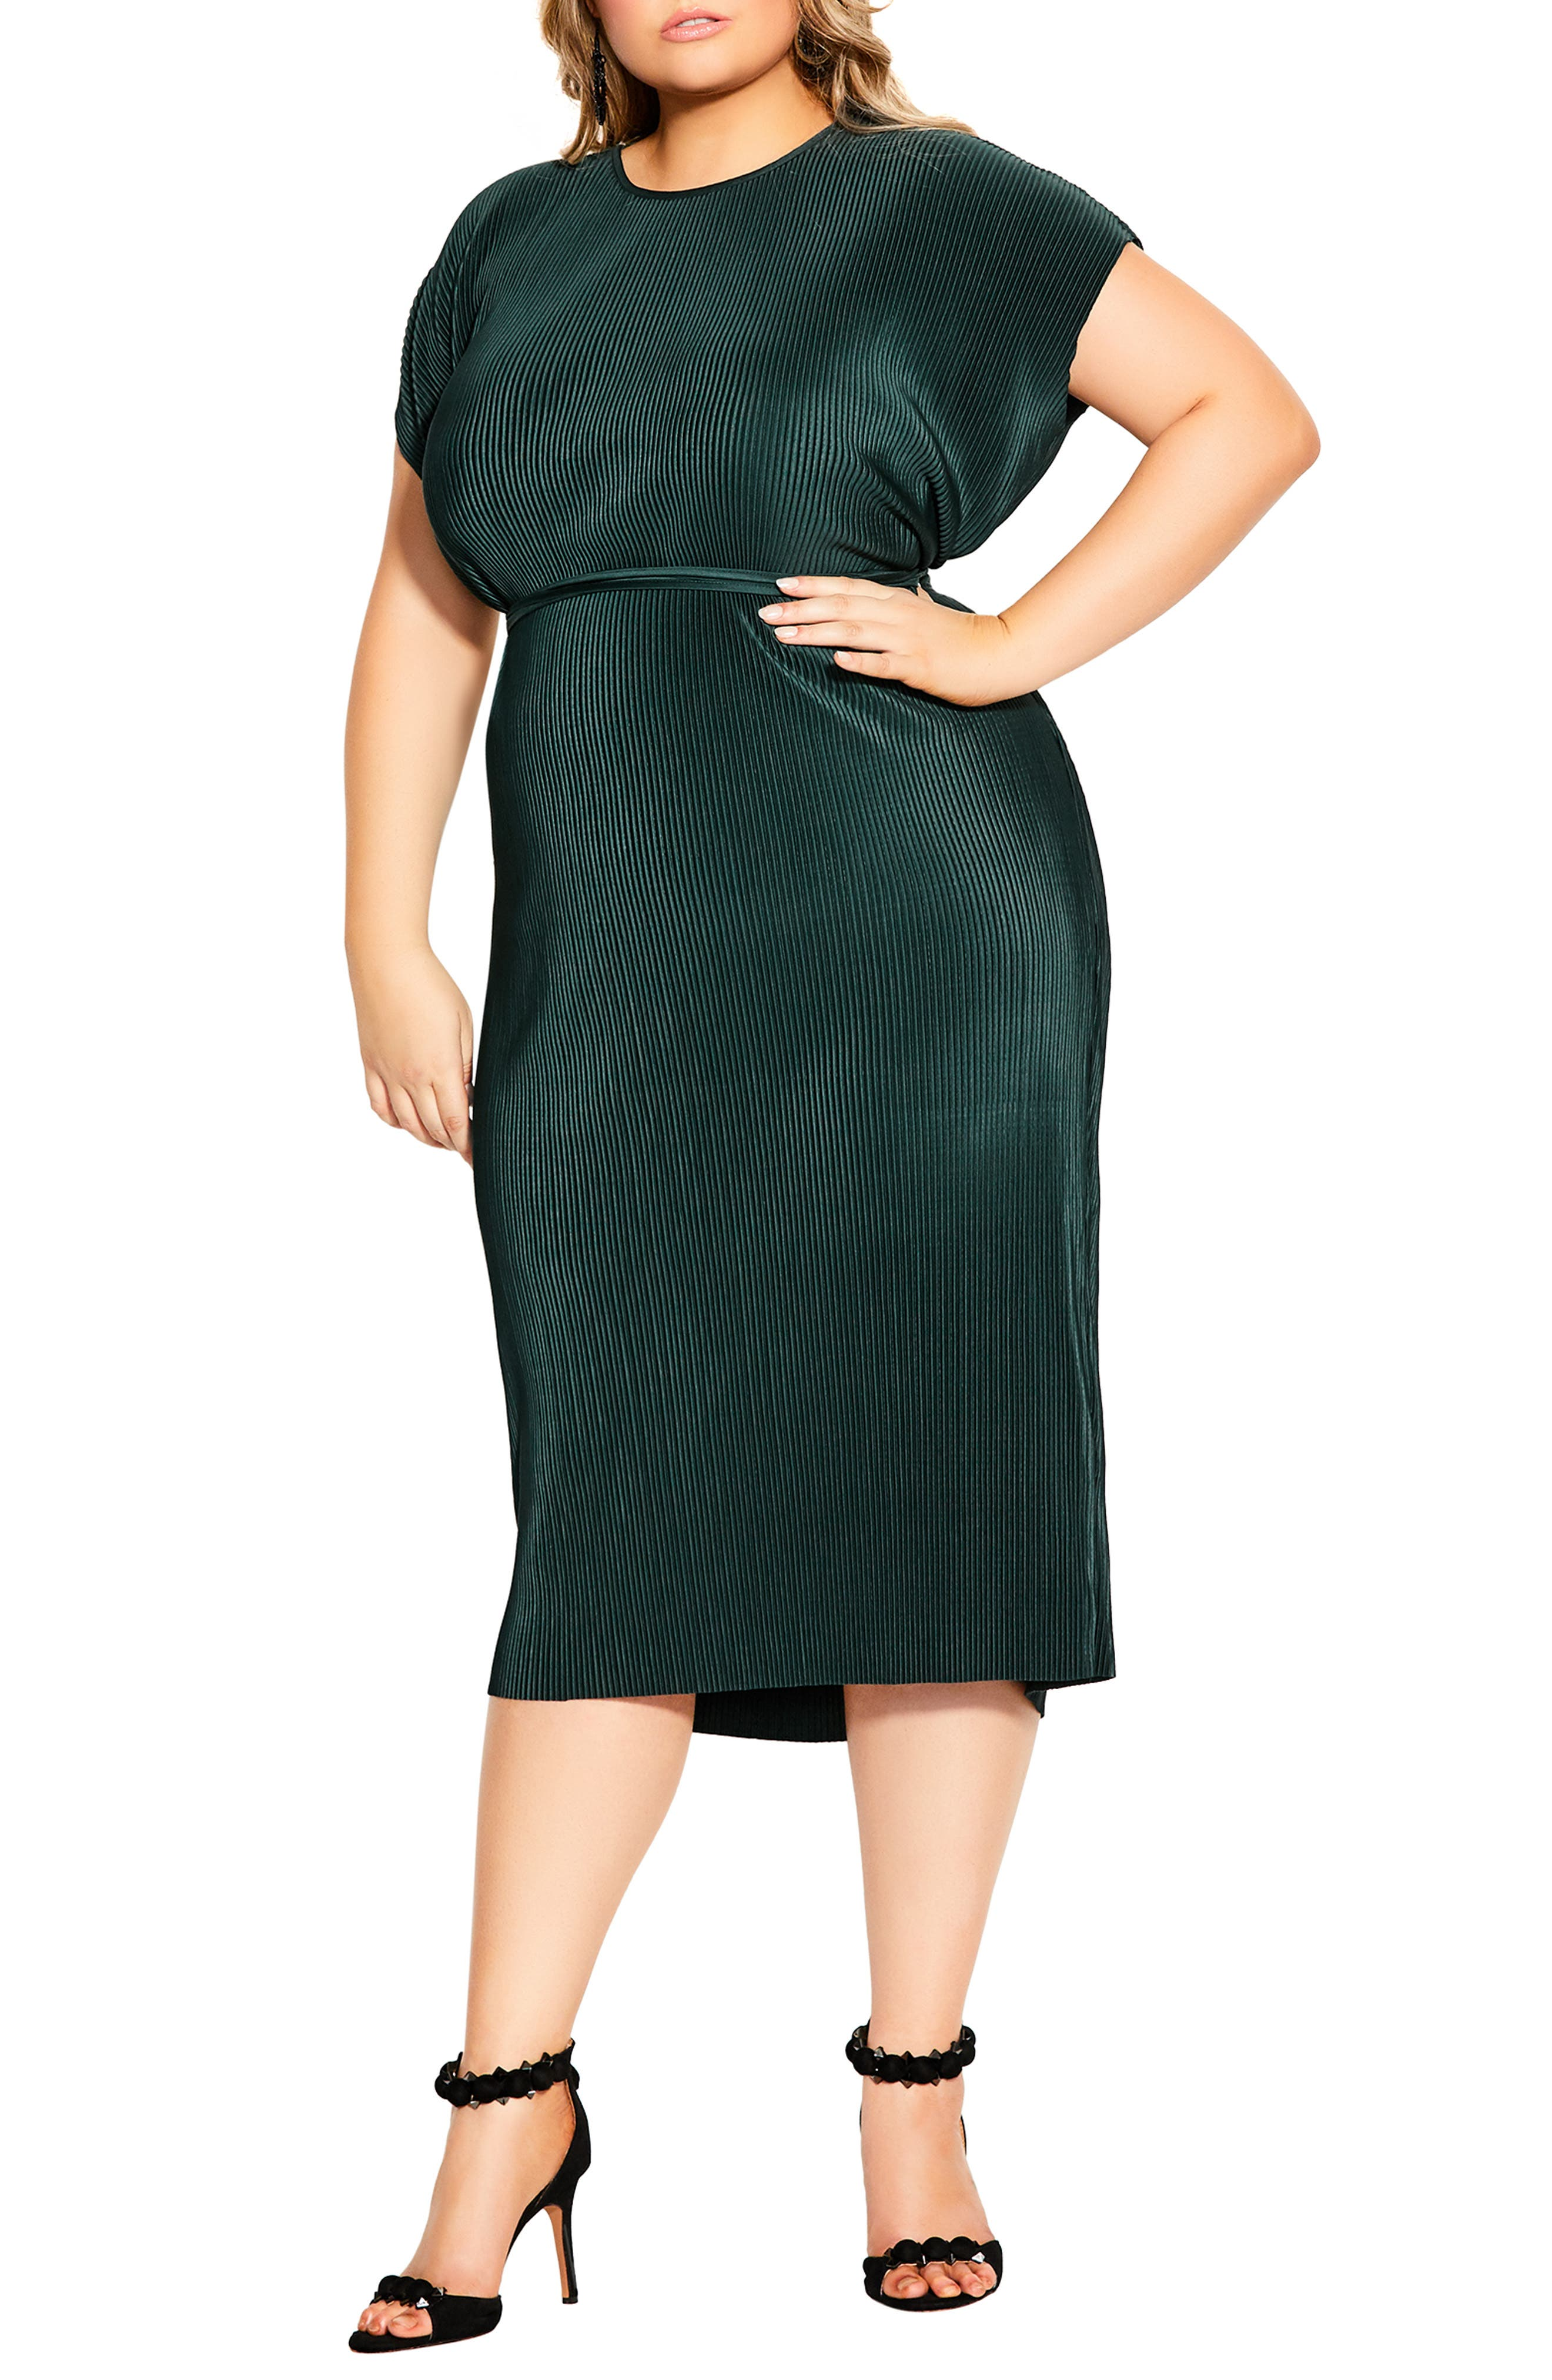 BPQ/_W Plus Size Cotton Dress for Womens Round Neck Short Sleeve Boho Print Loose Knee-Length Dress